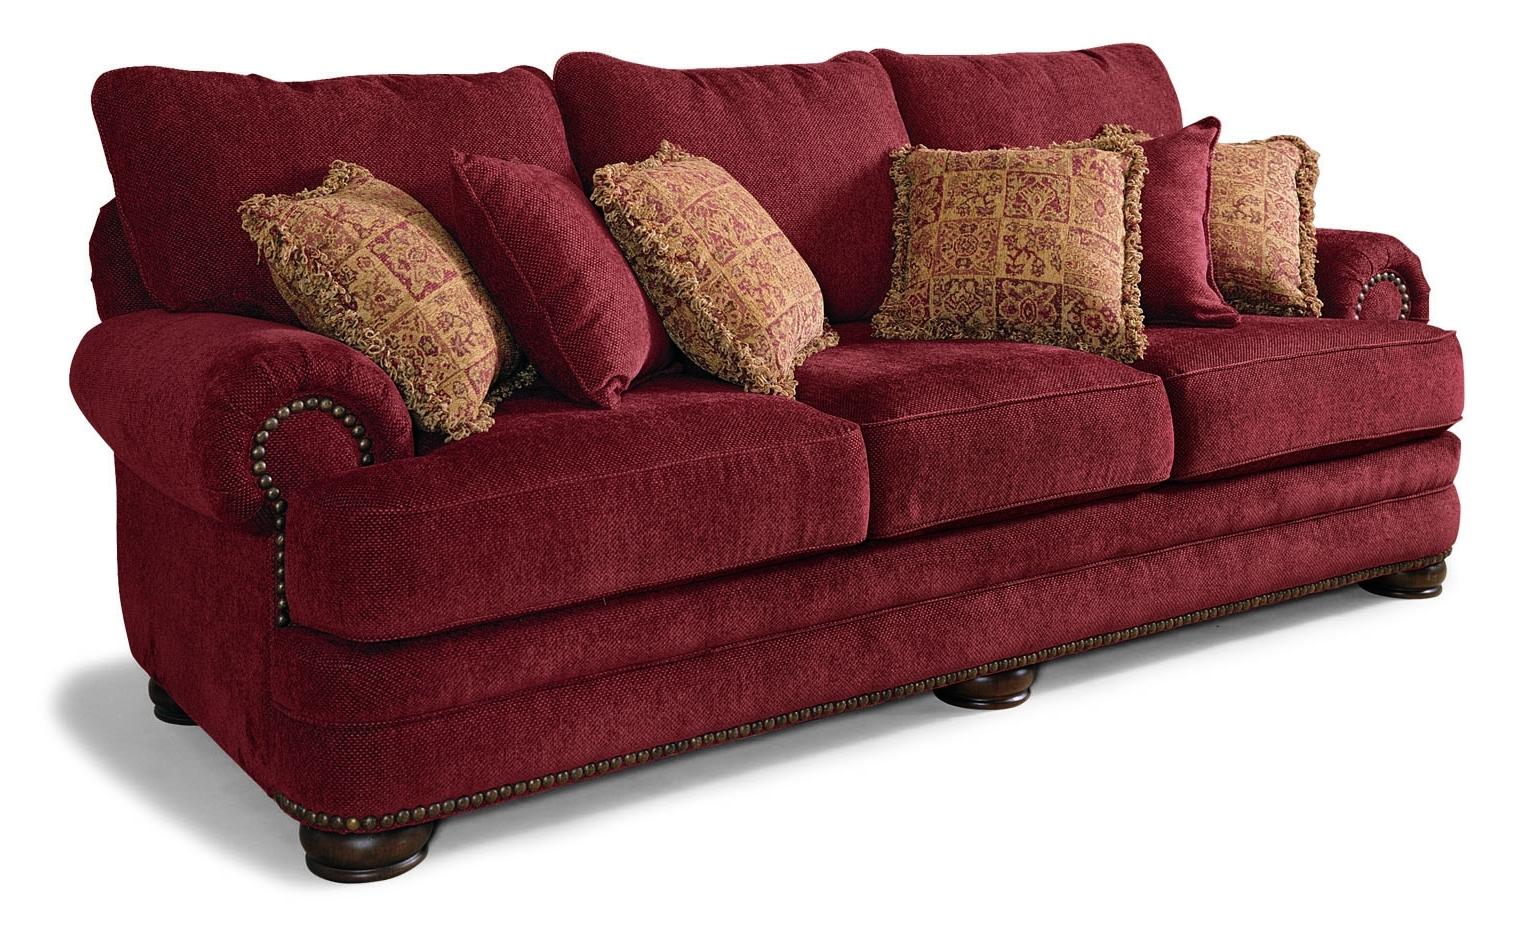 Stanton Stationary Sofa – Lane 86330, 863 30 Within 2019 Lane Furniture Sofas (View 13 of 20)